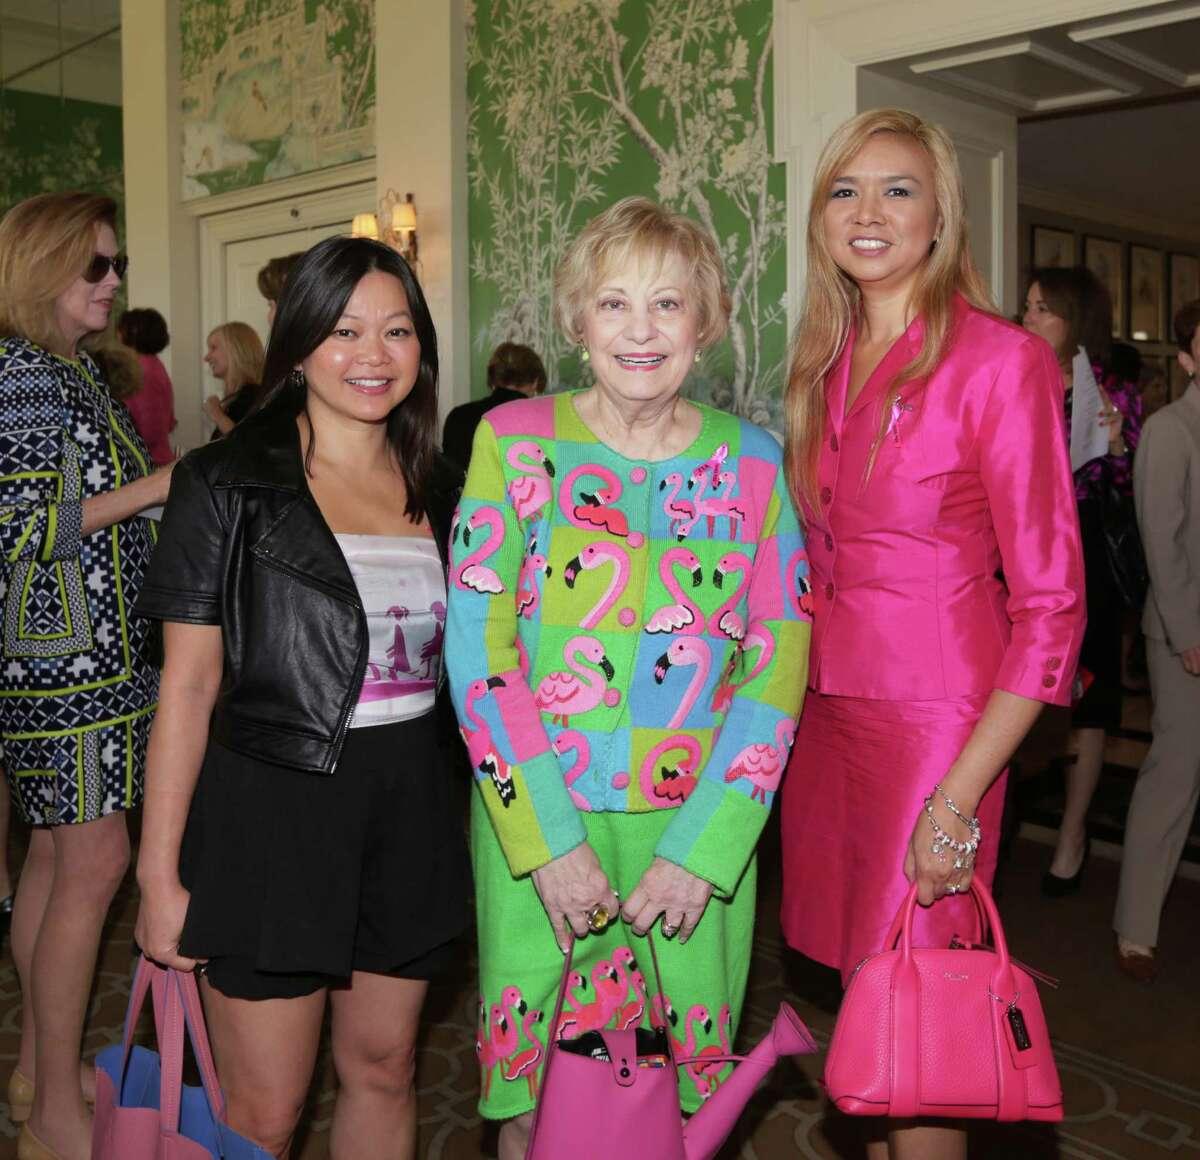 Chloe Dao, Kay King and Peta-Gay Ledbetter